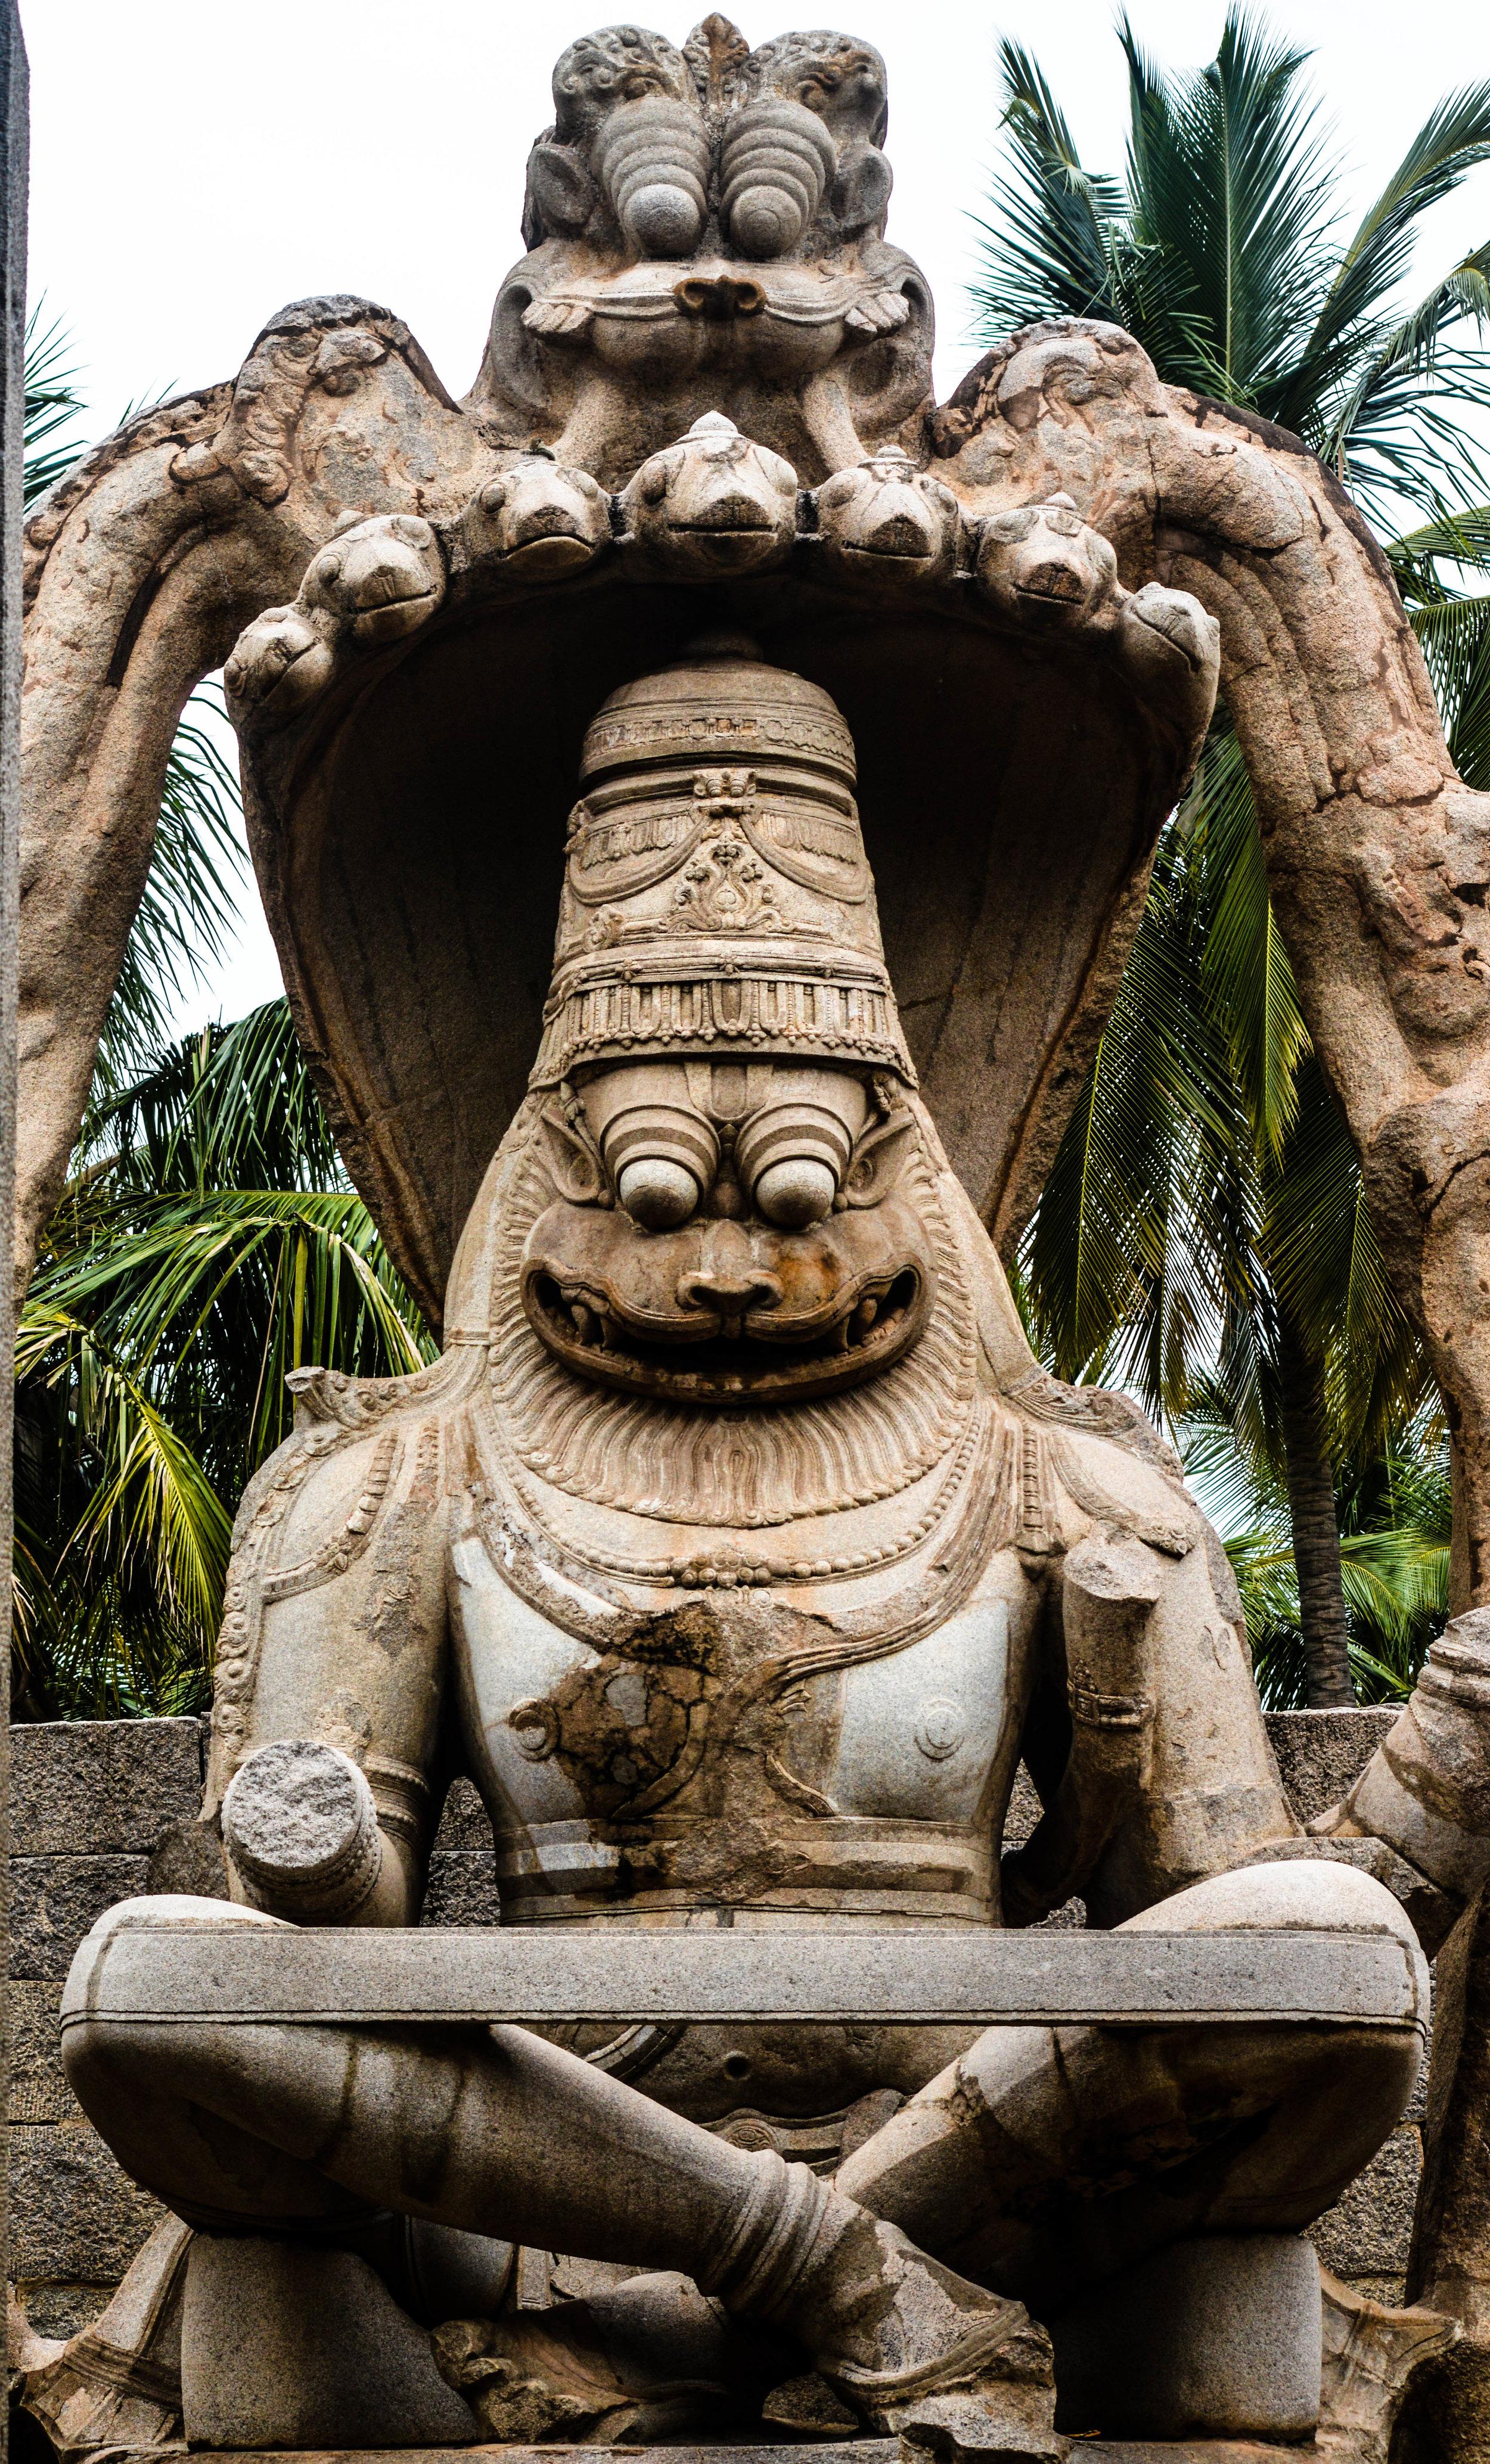 A statue of Ugra Narasimha, one of the incarnations of Lord Vishnu